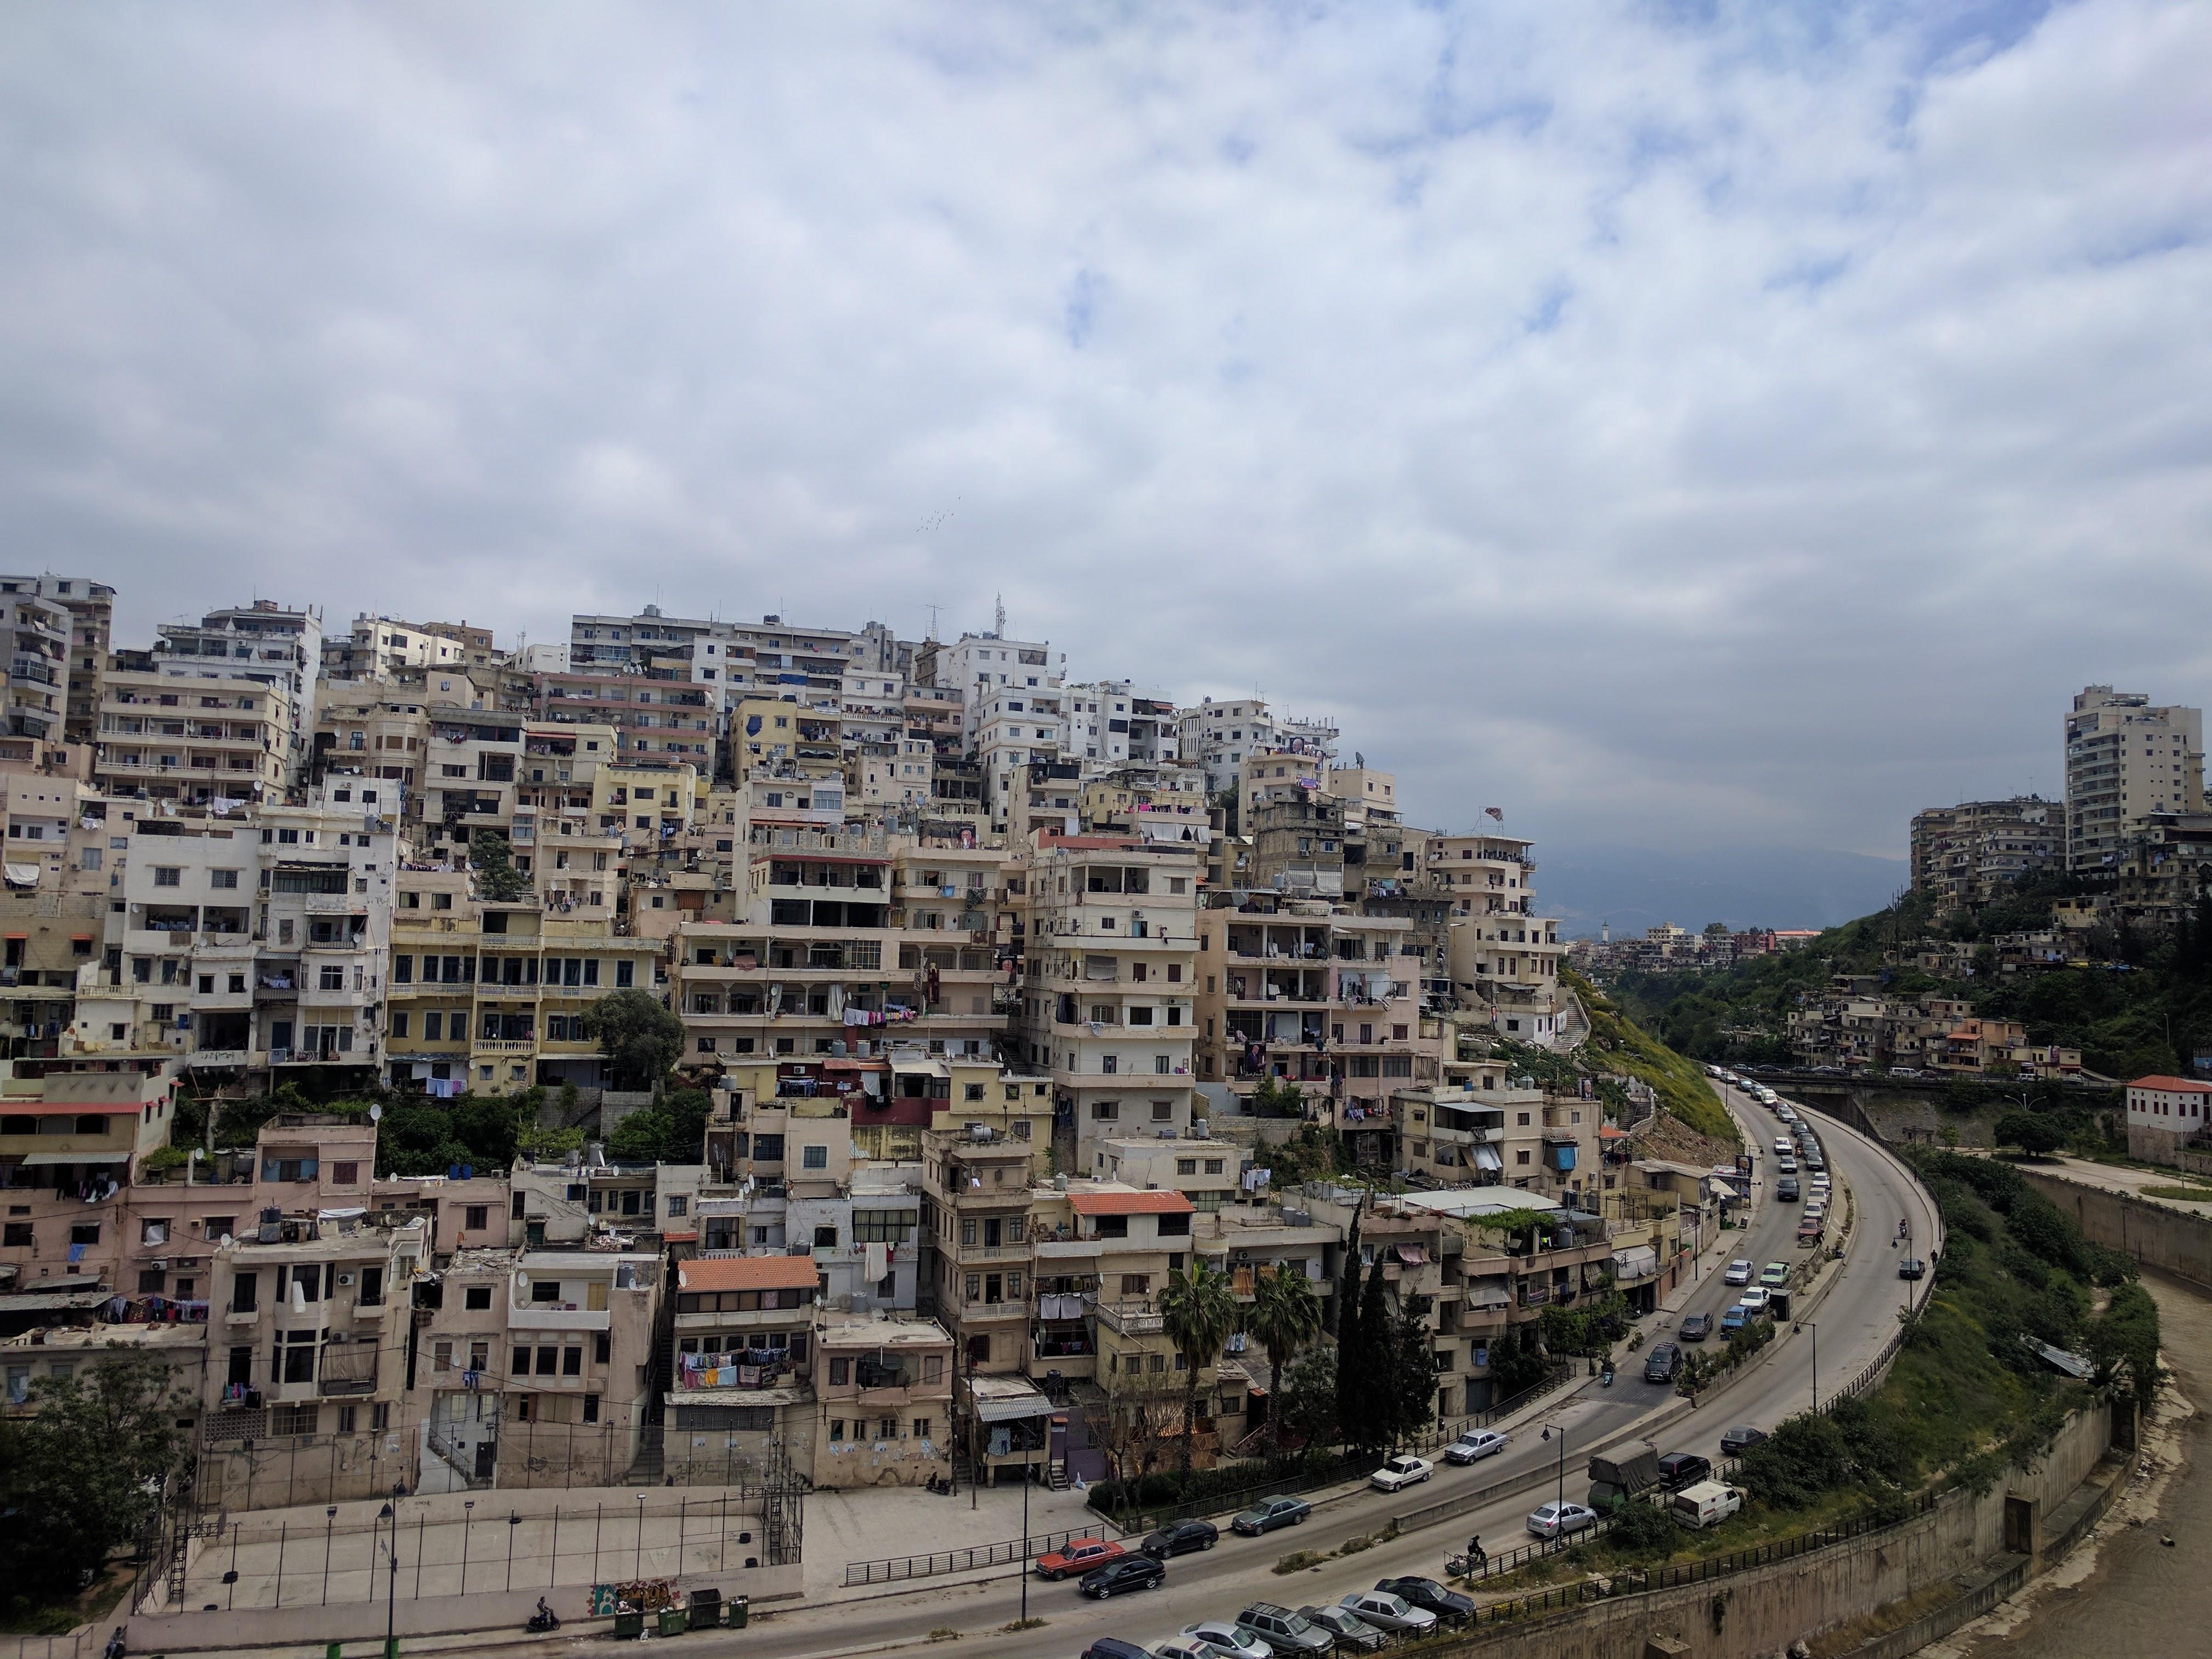 Tripolin kaupunkikuvaa